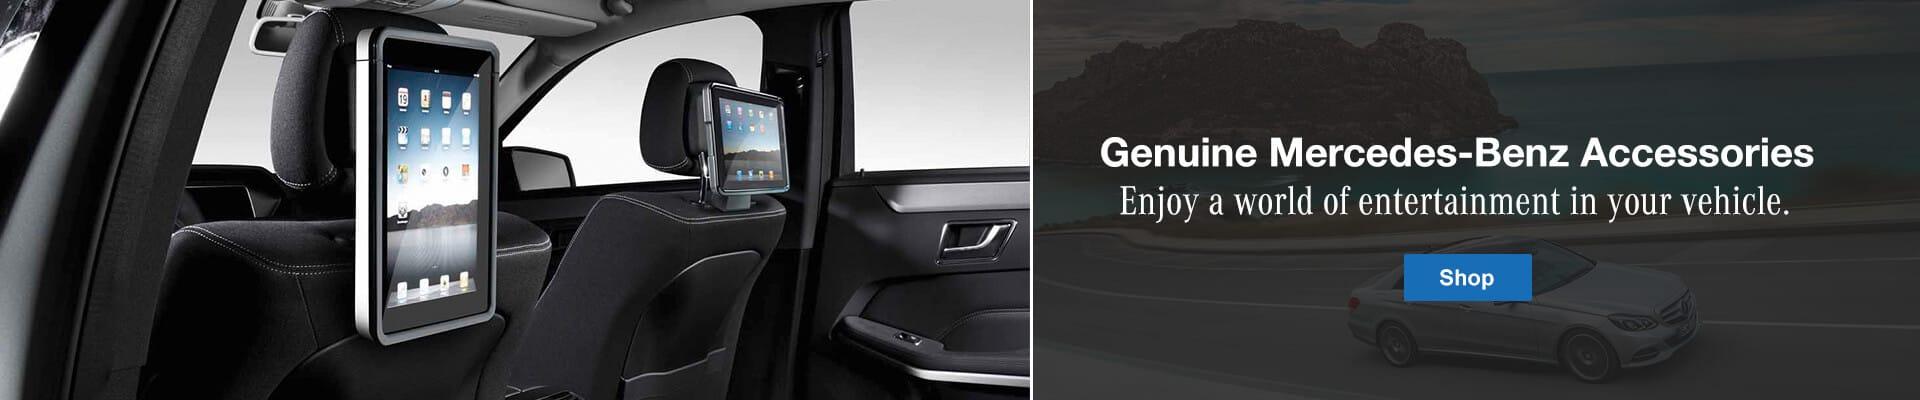 Mercedes-Benz of Easton Banner 2